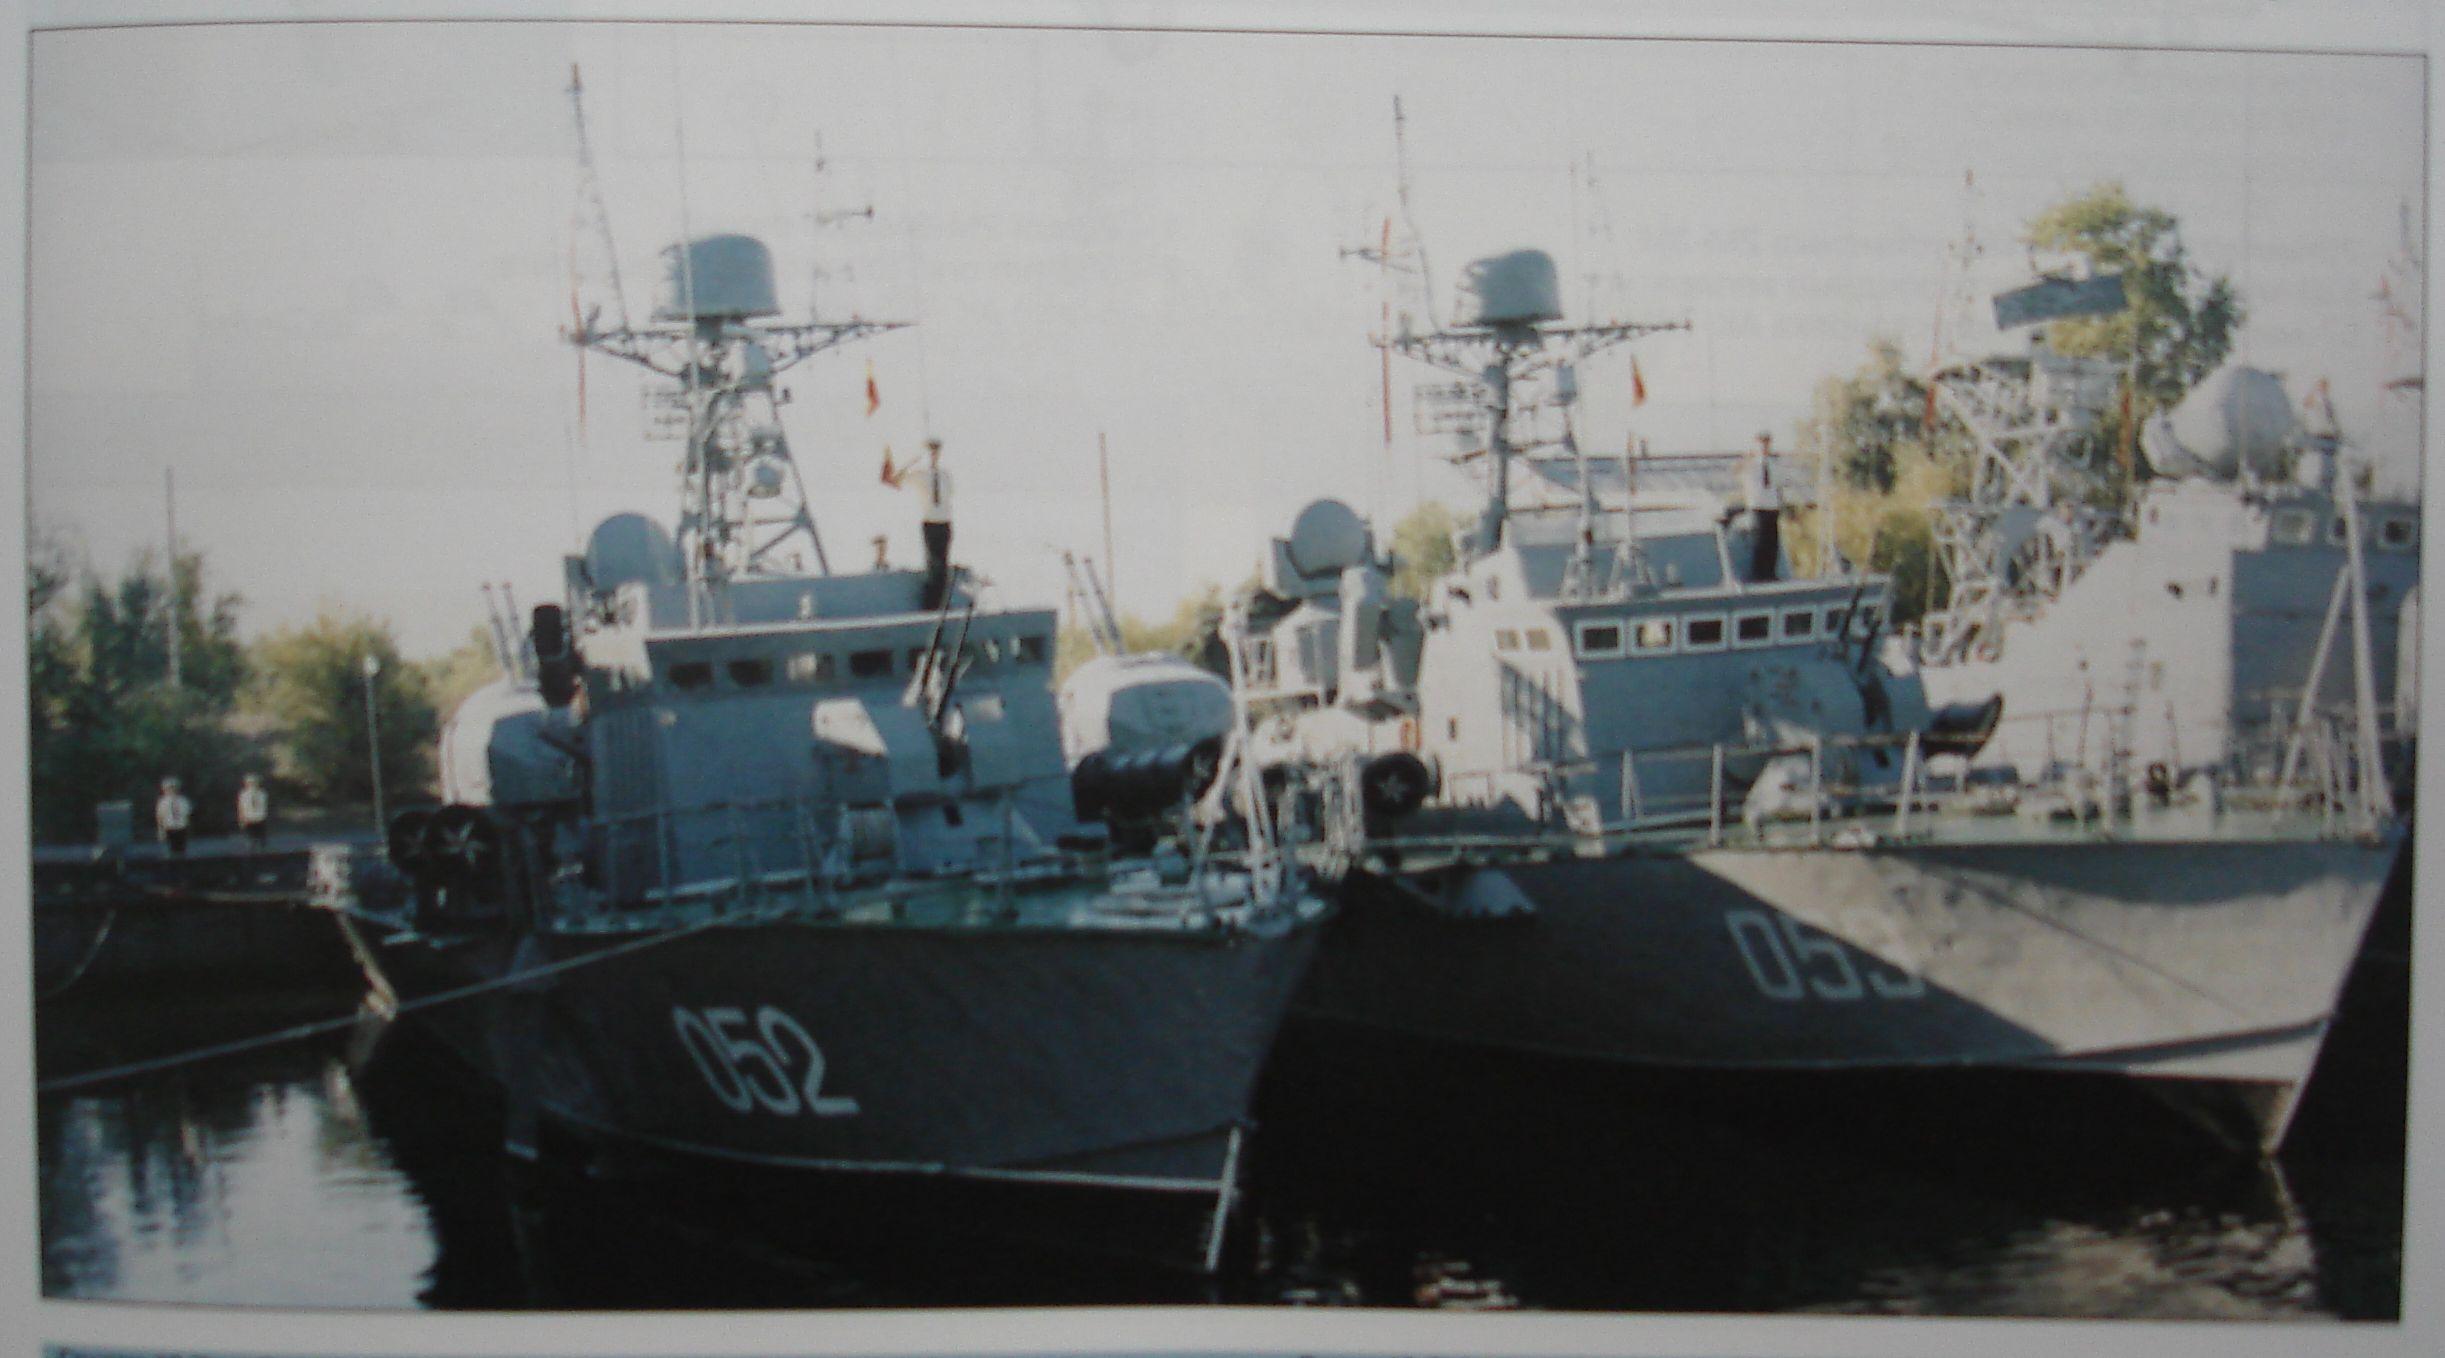 Caspian_206M.jpg